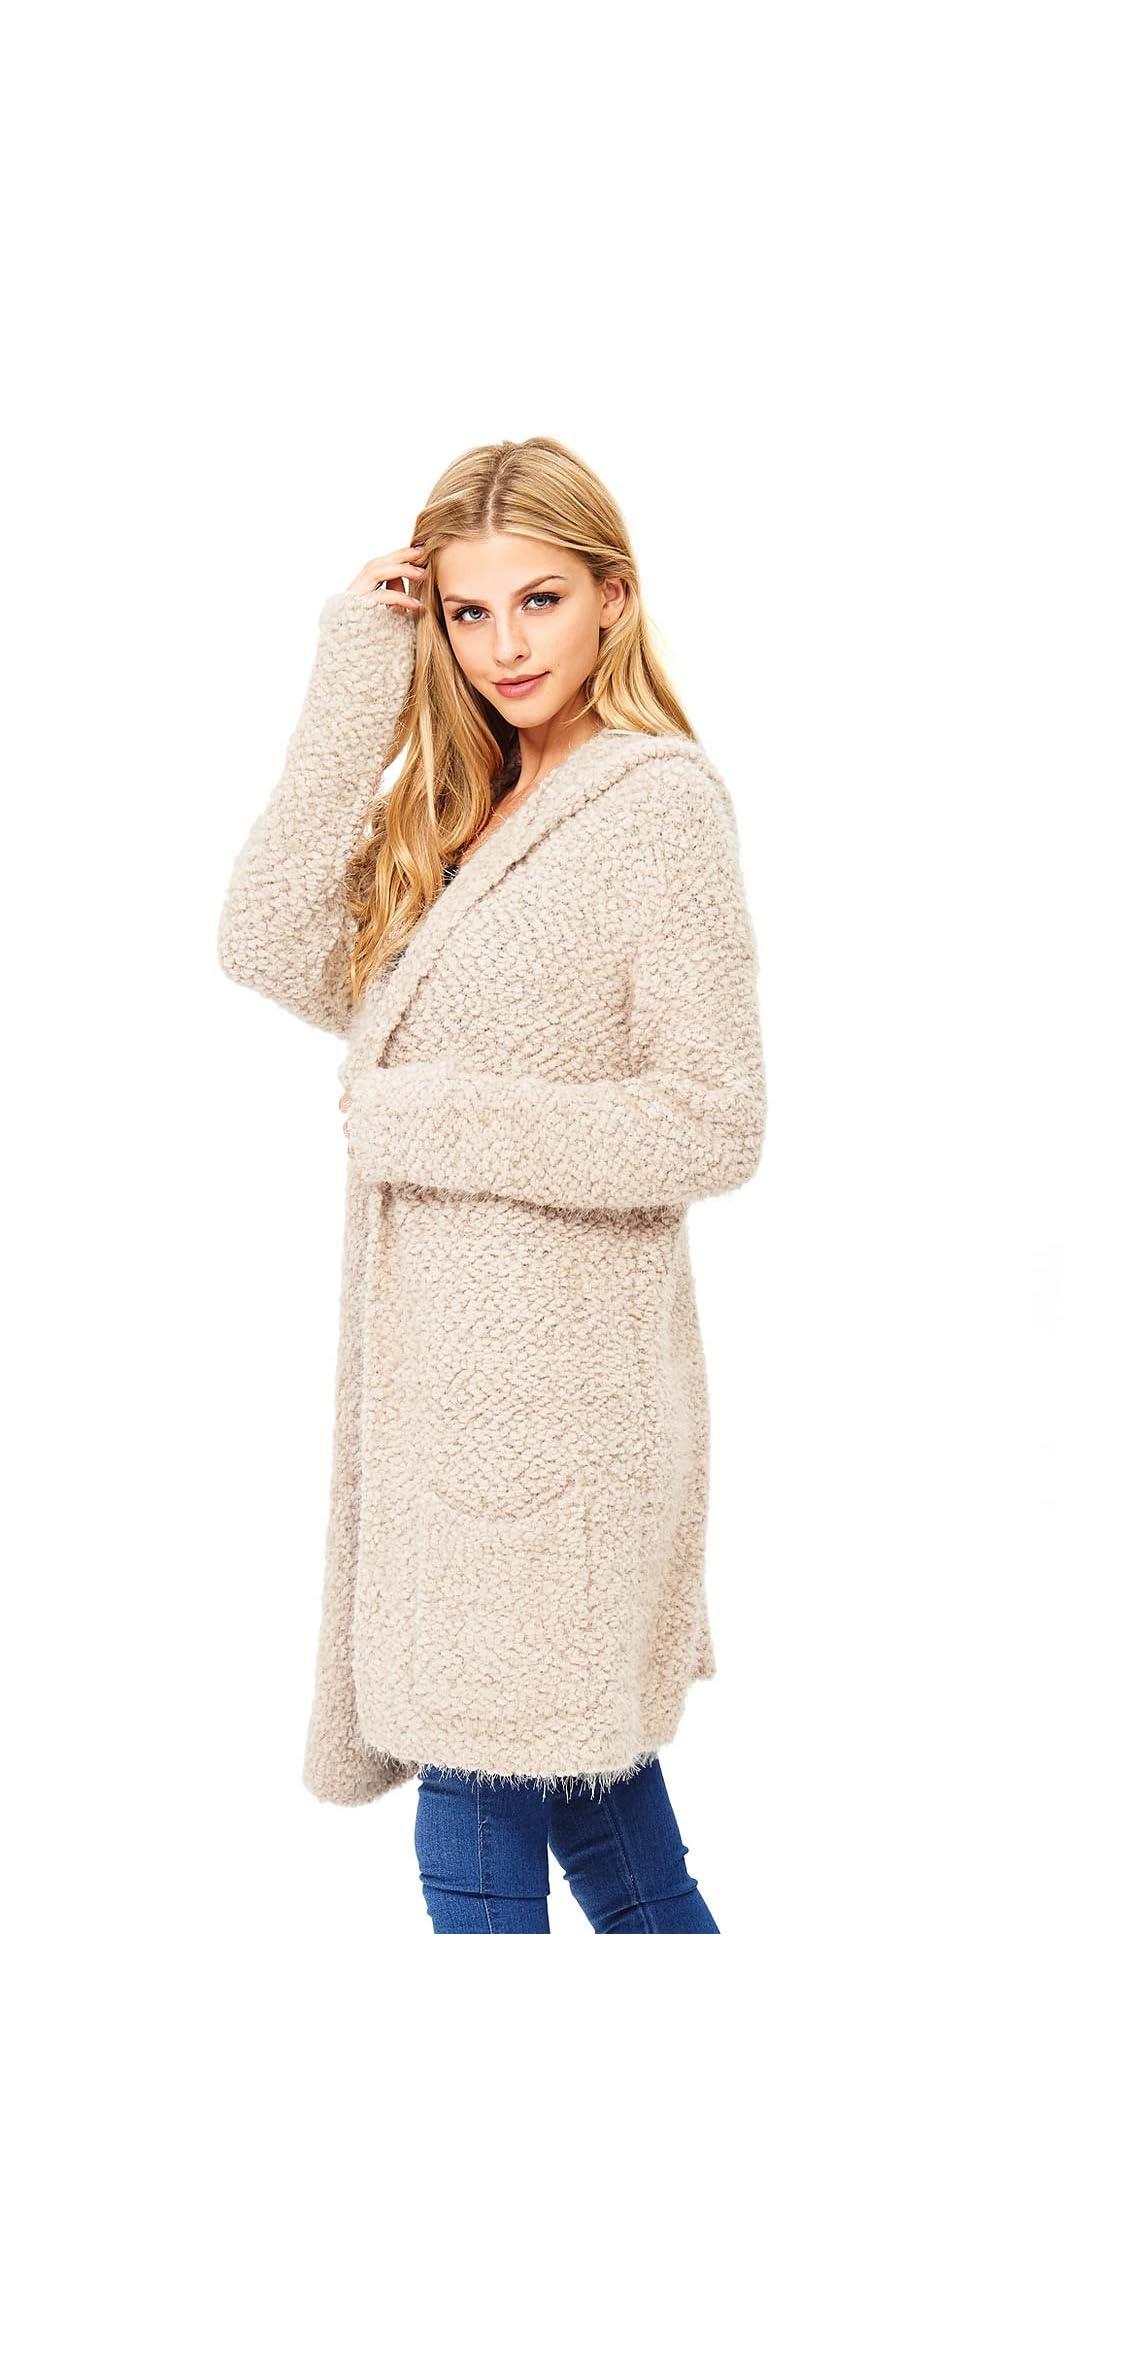 Women's Hoodie Eyelash Cardigan Sweater